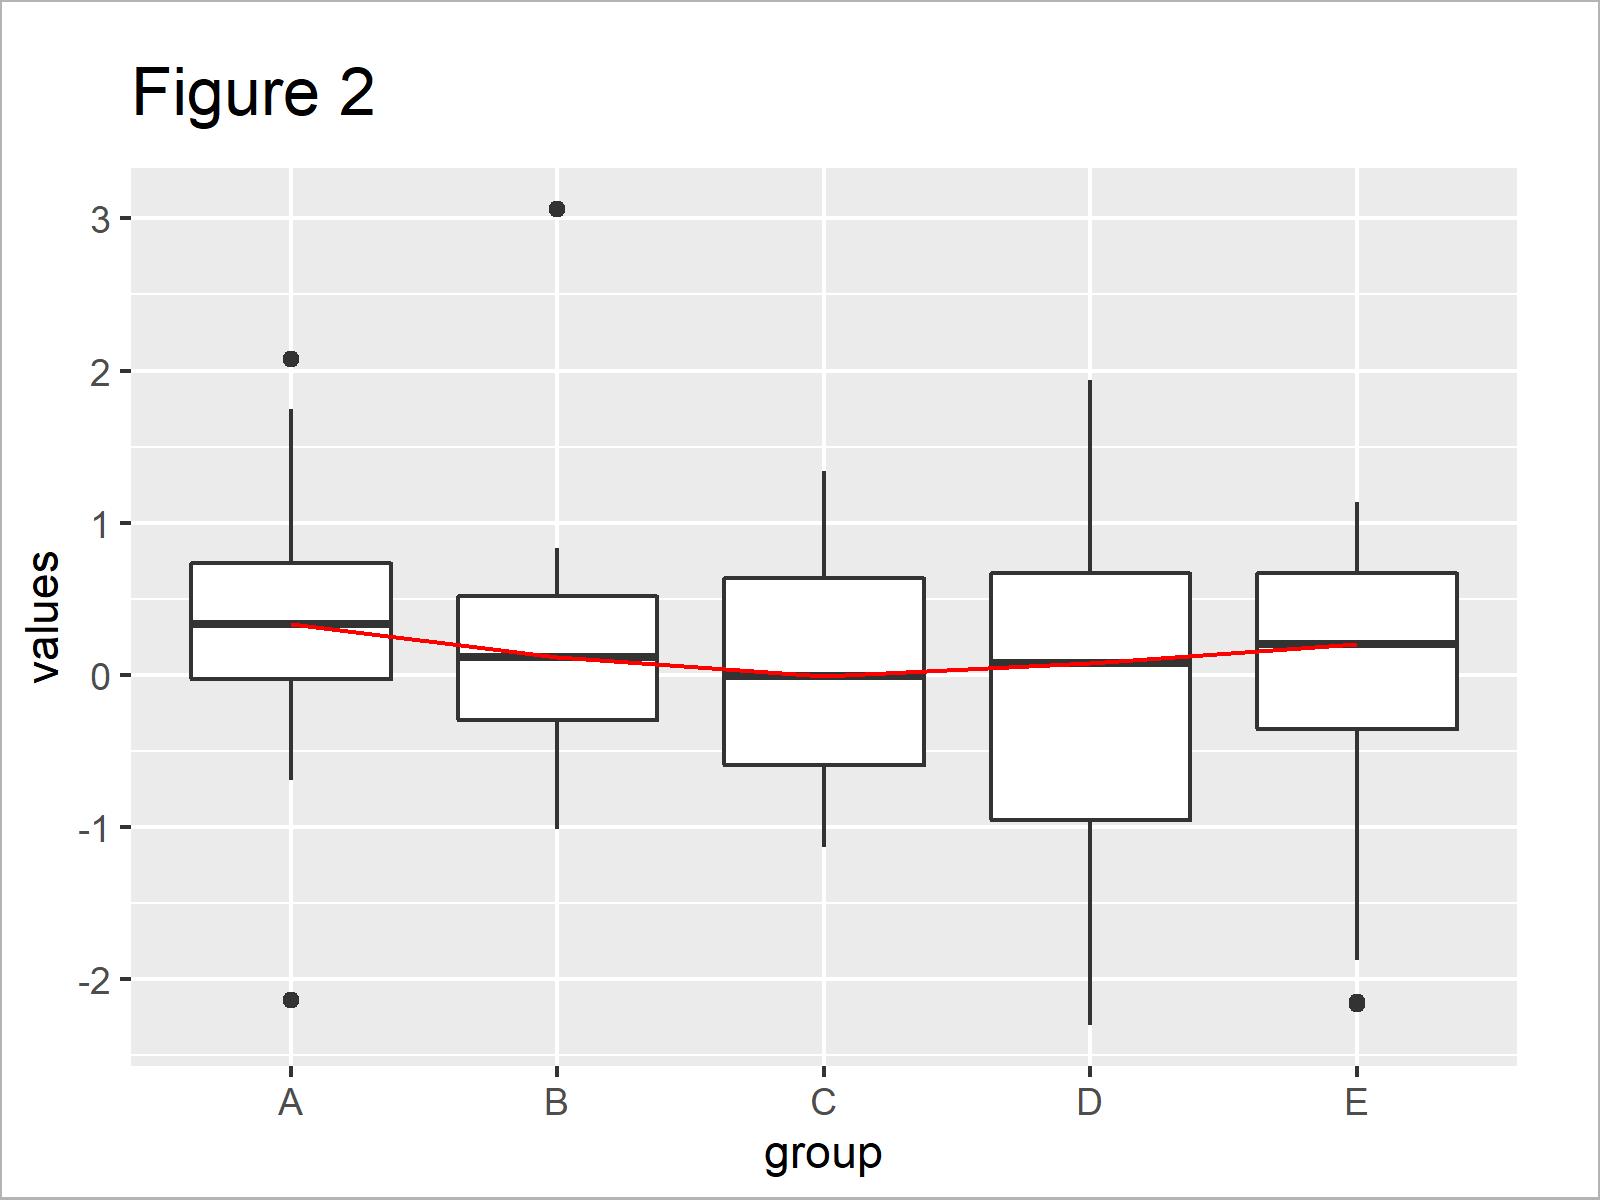 r graph figure 2 overlay ggplot2 boxplot line r